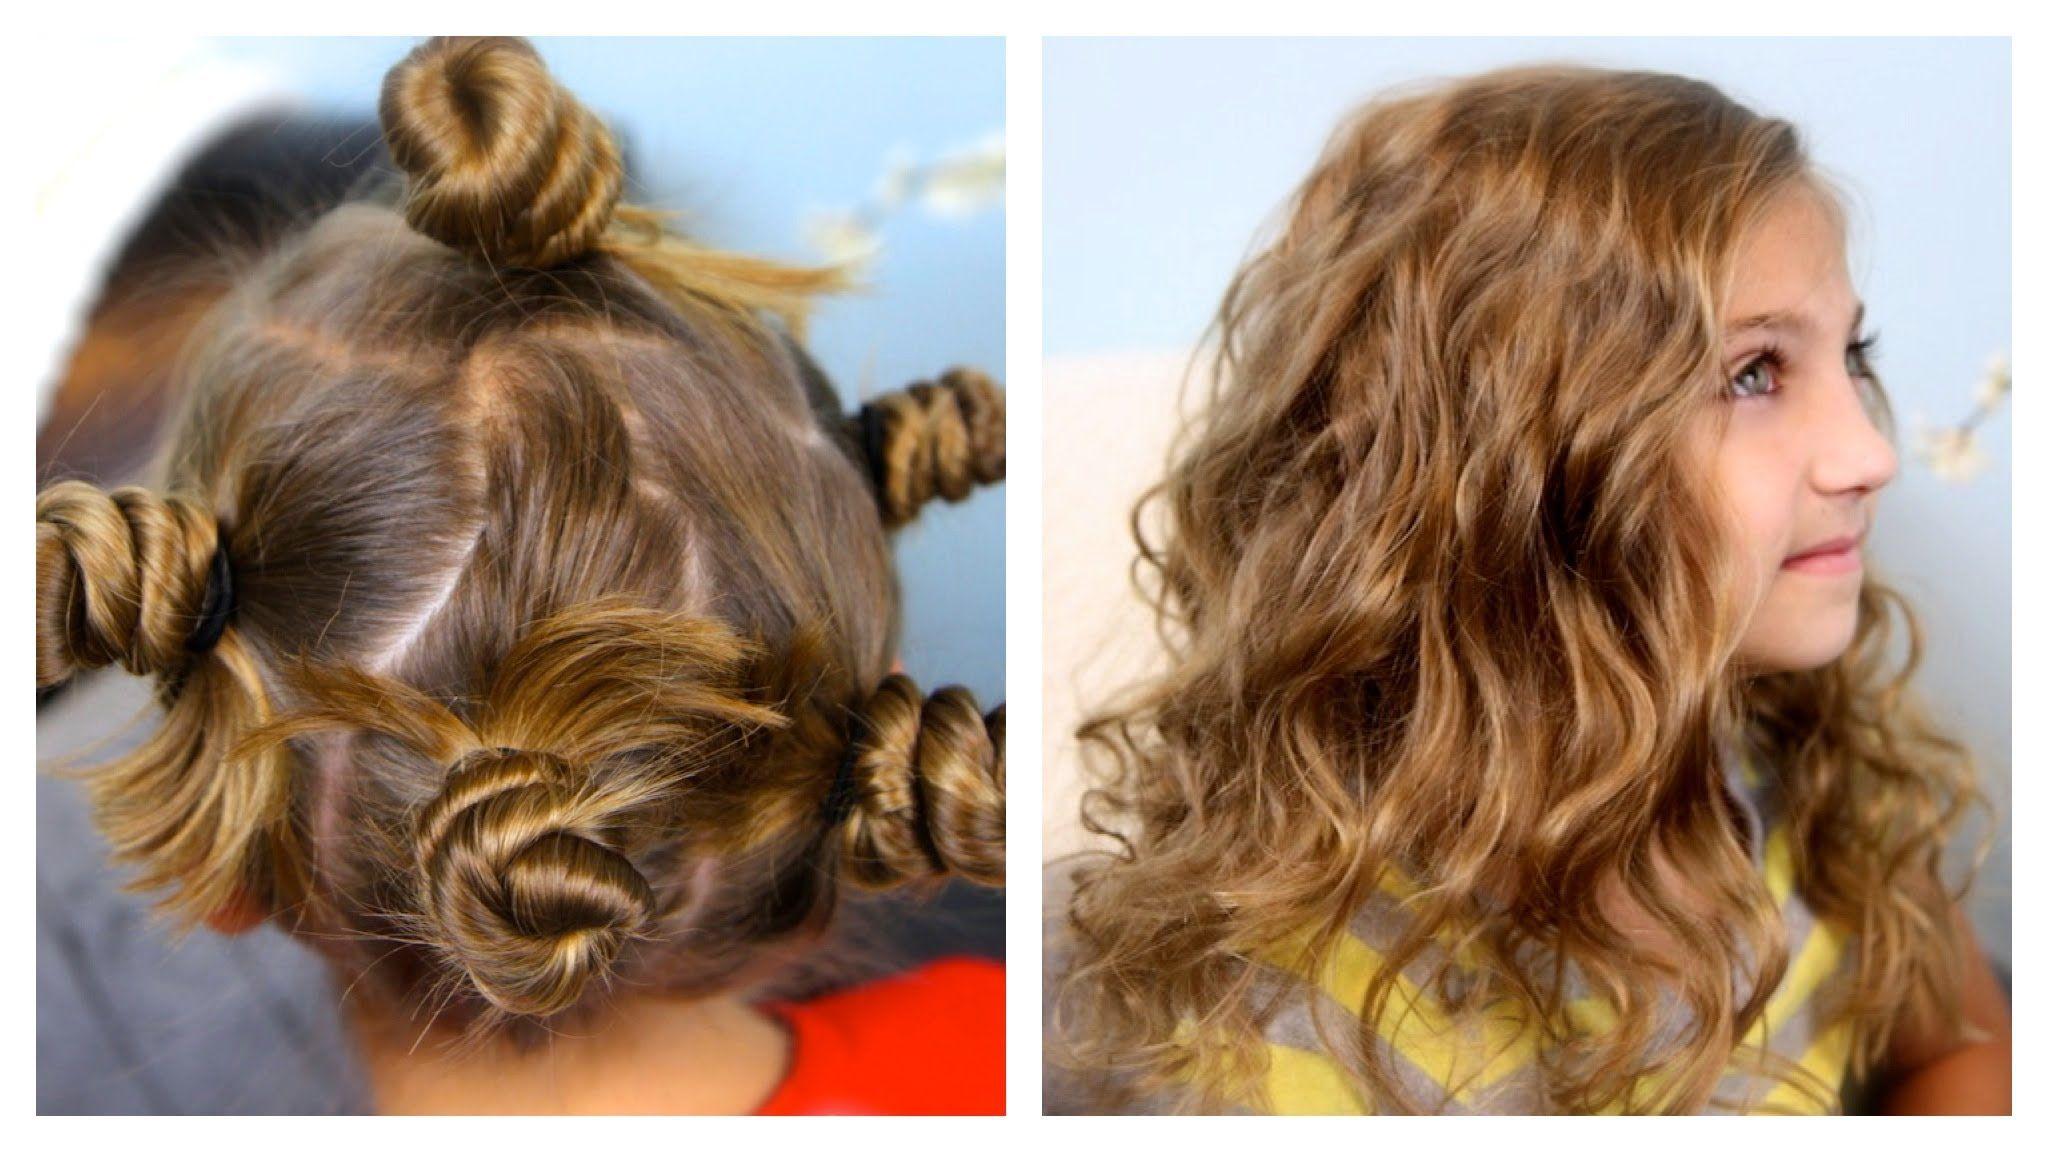 Bantu Knot Curls Easy No Heat Curls